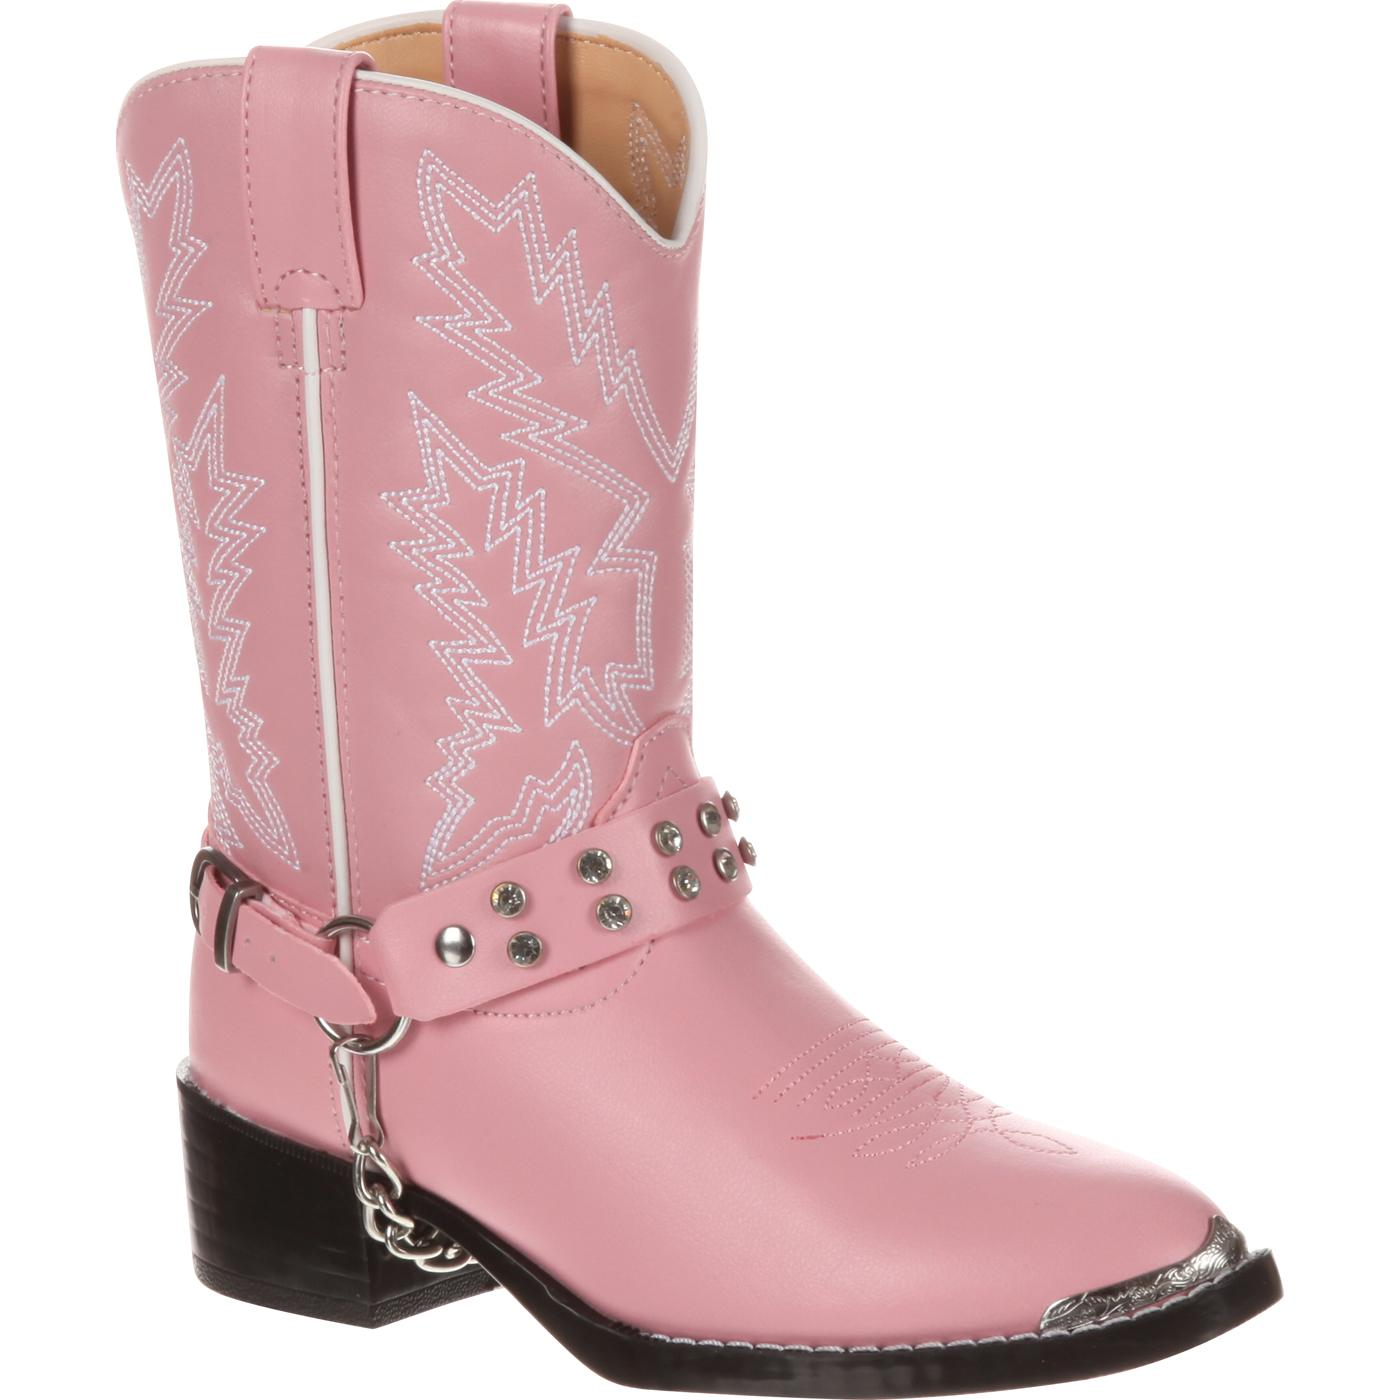 d70c21d32c5993 Durango Kid s Pink Rhinestone Western Boots - Style  BT568